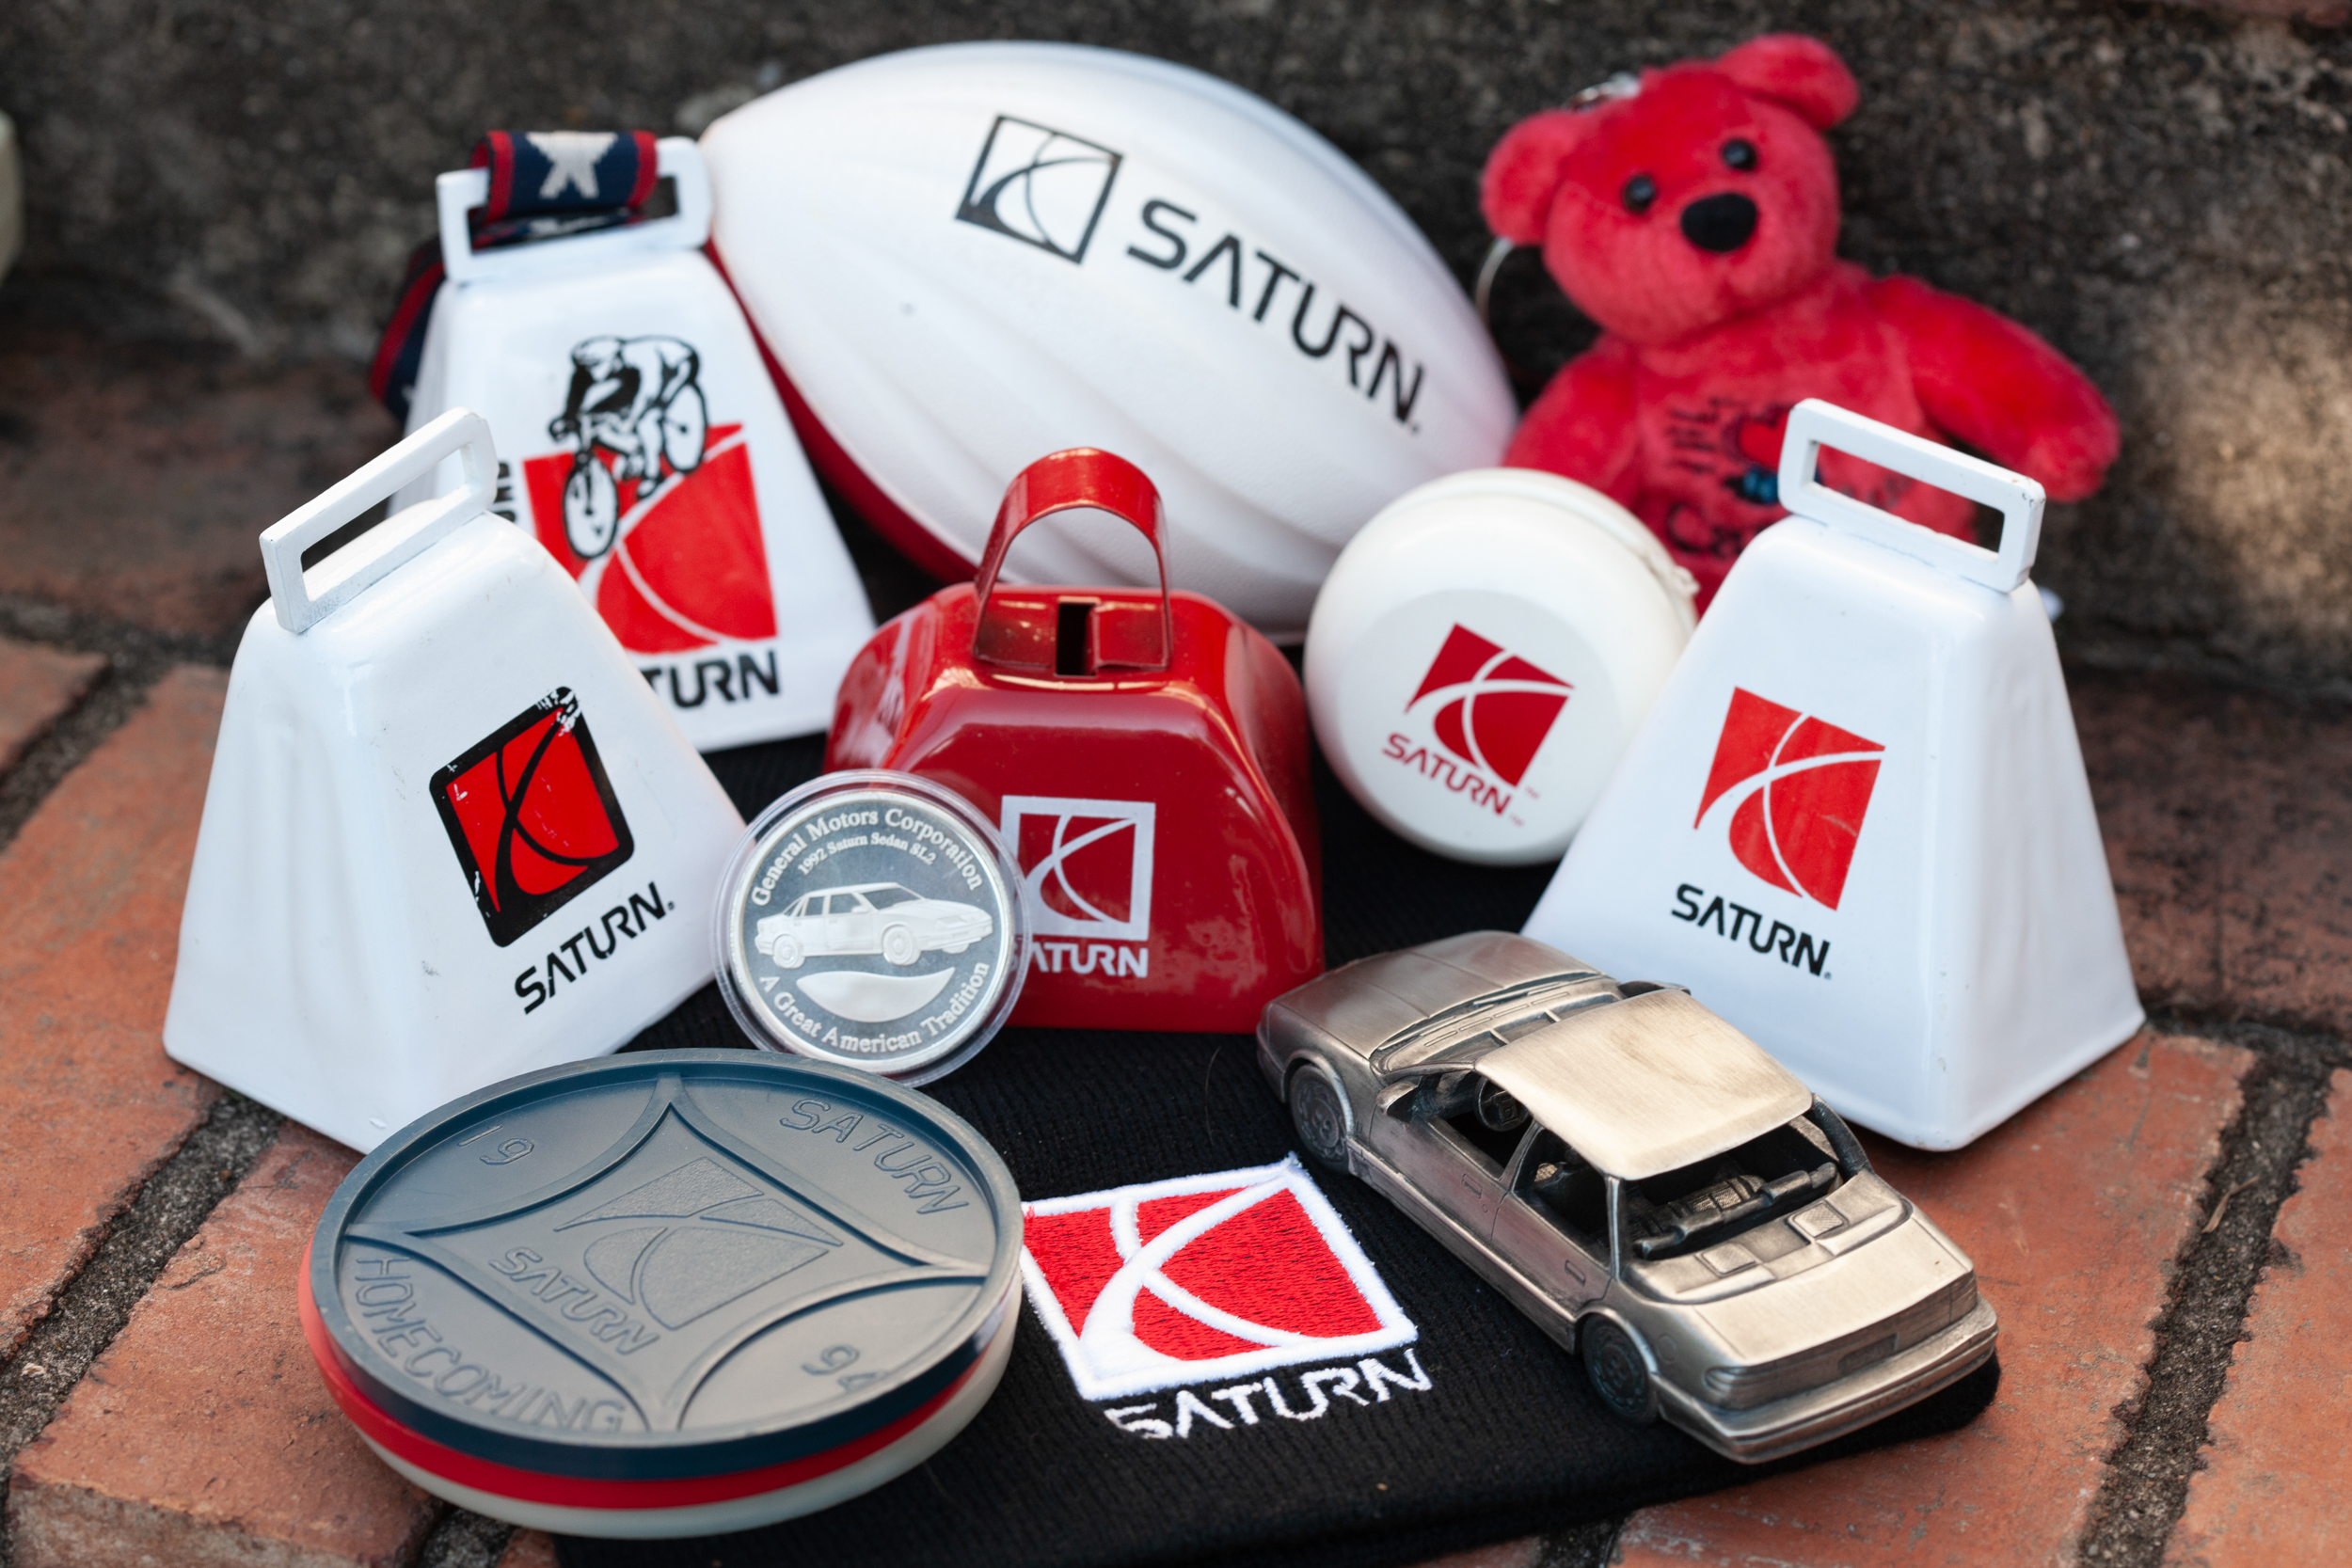 saturn branded automobilia